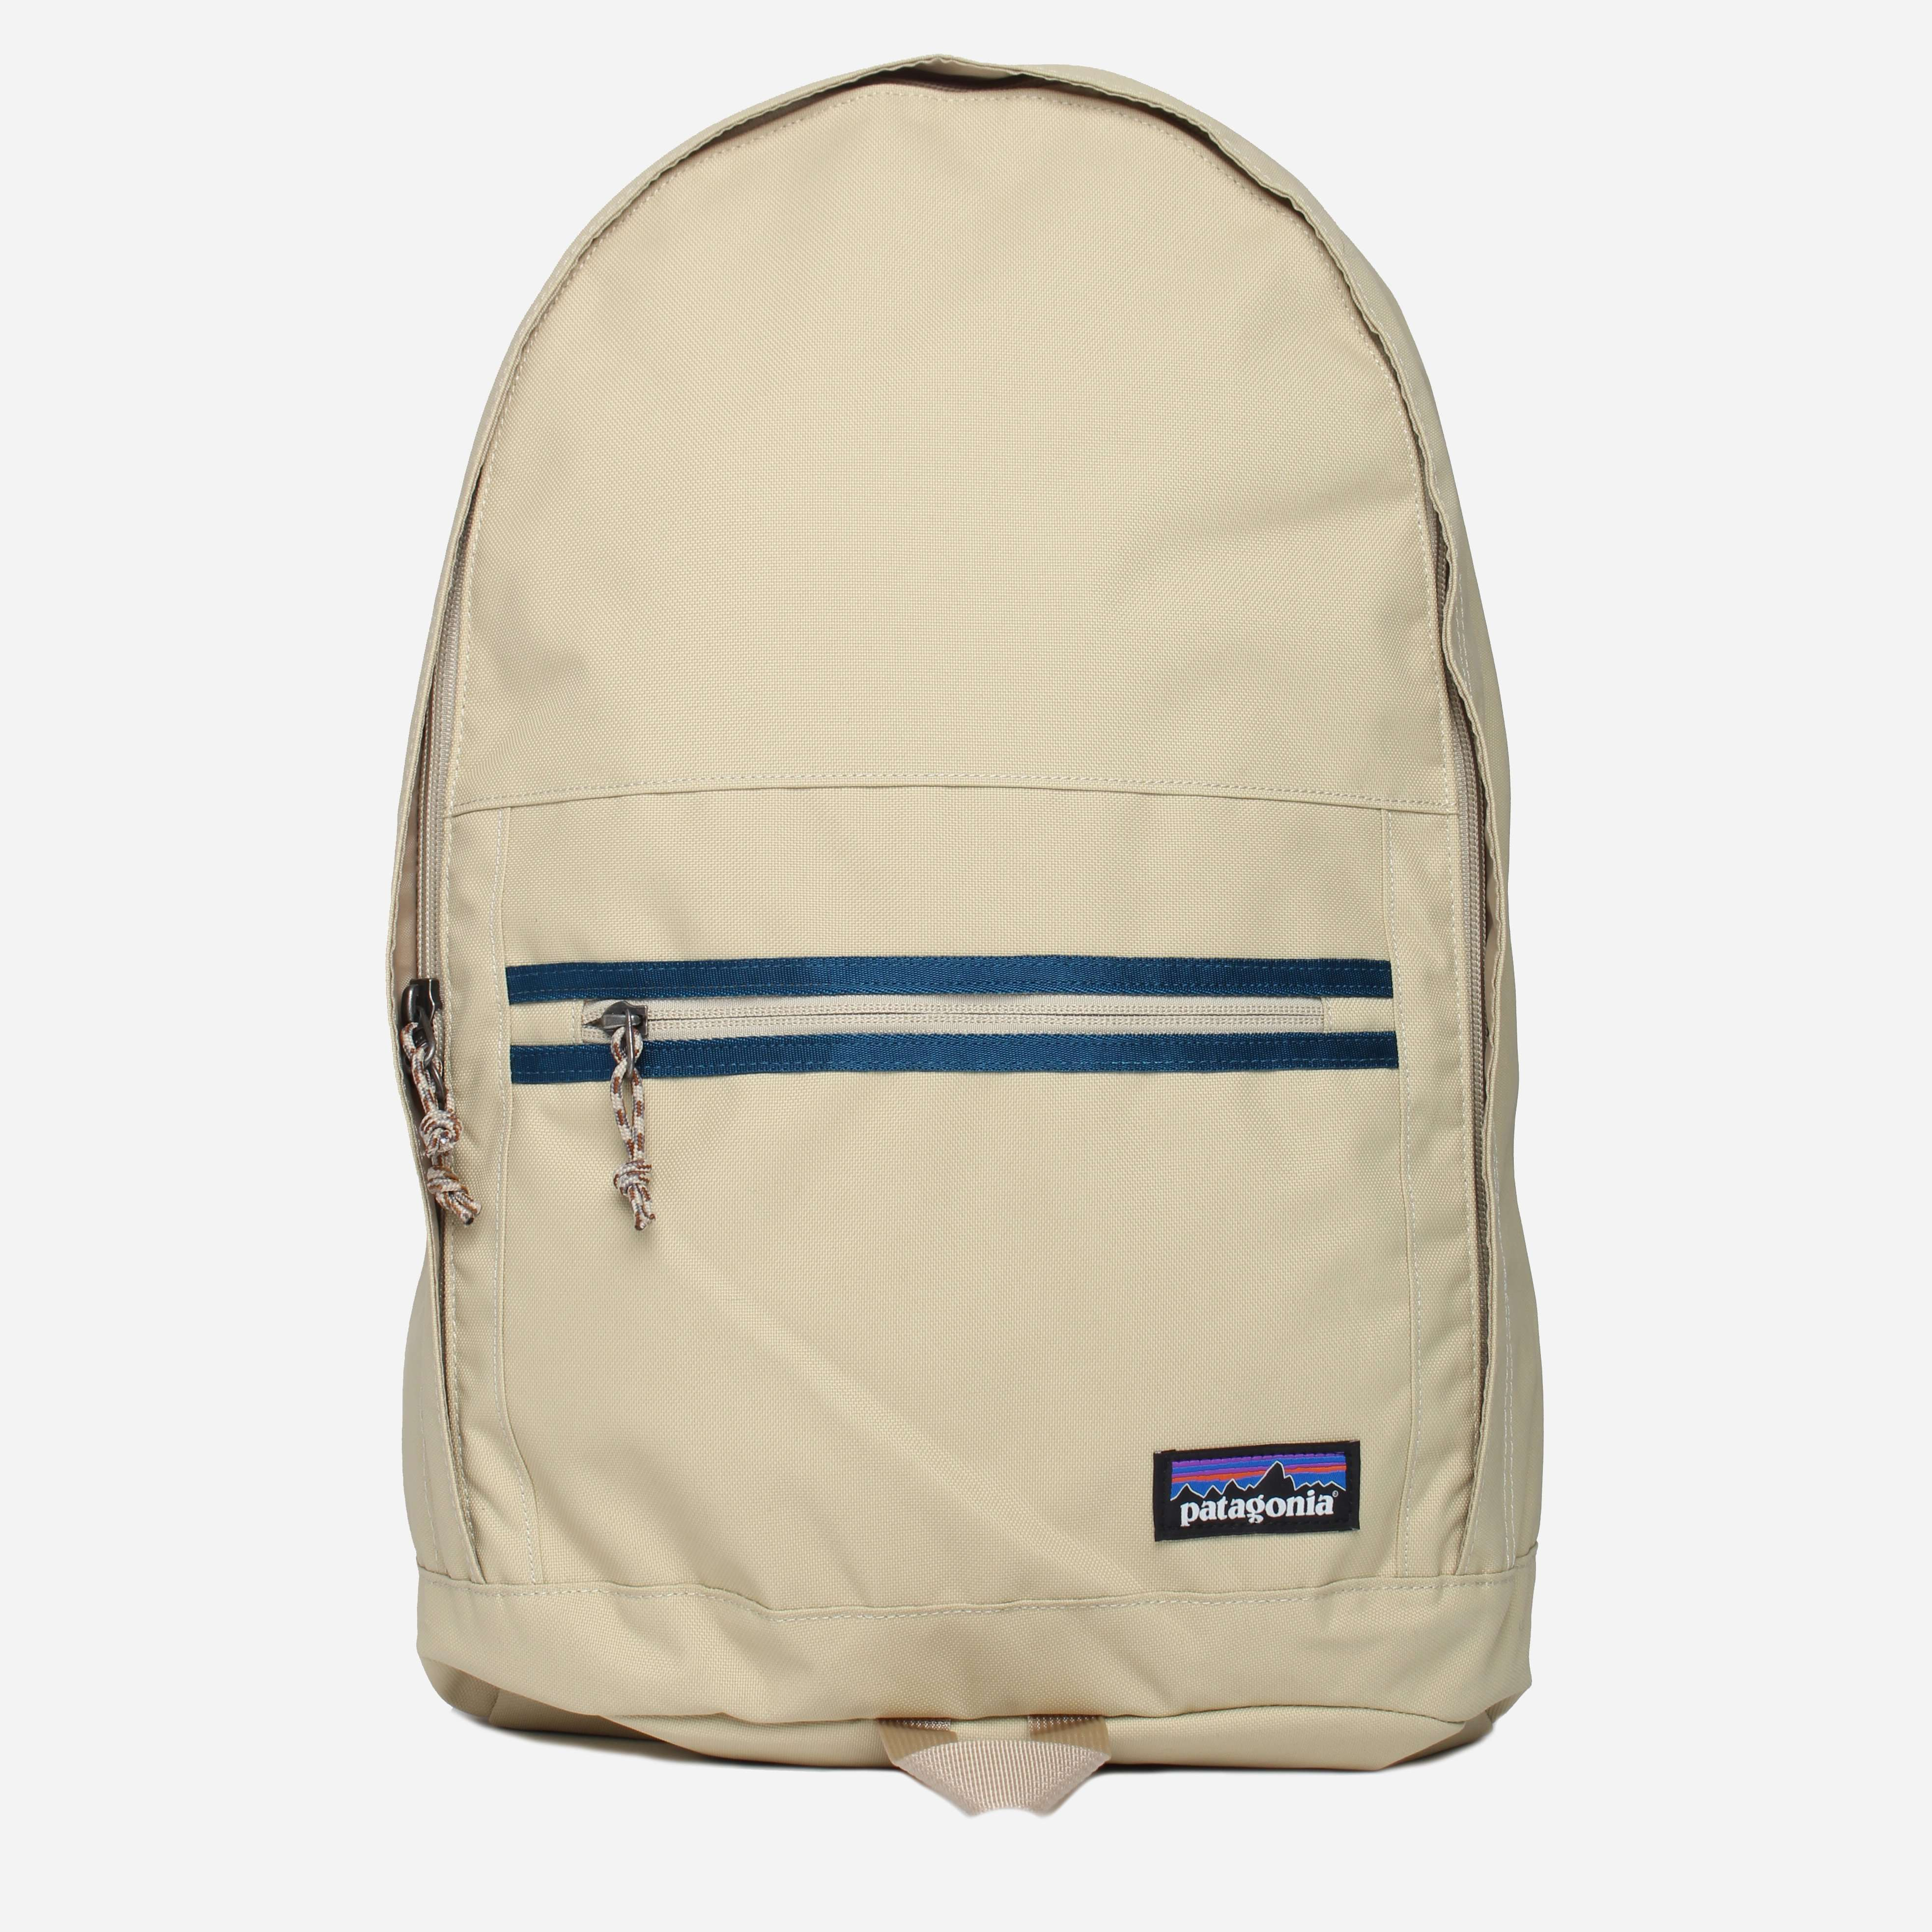 Patagonia Arbor Day Backpack 20L